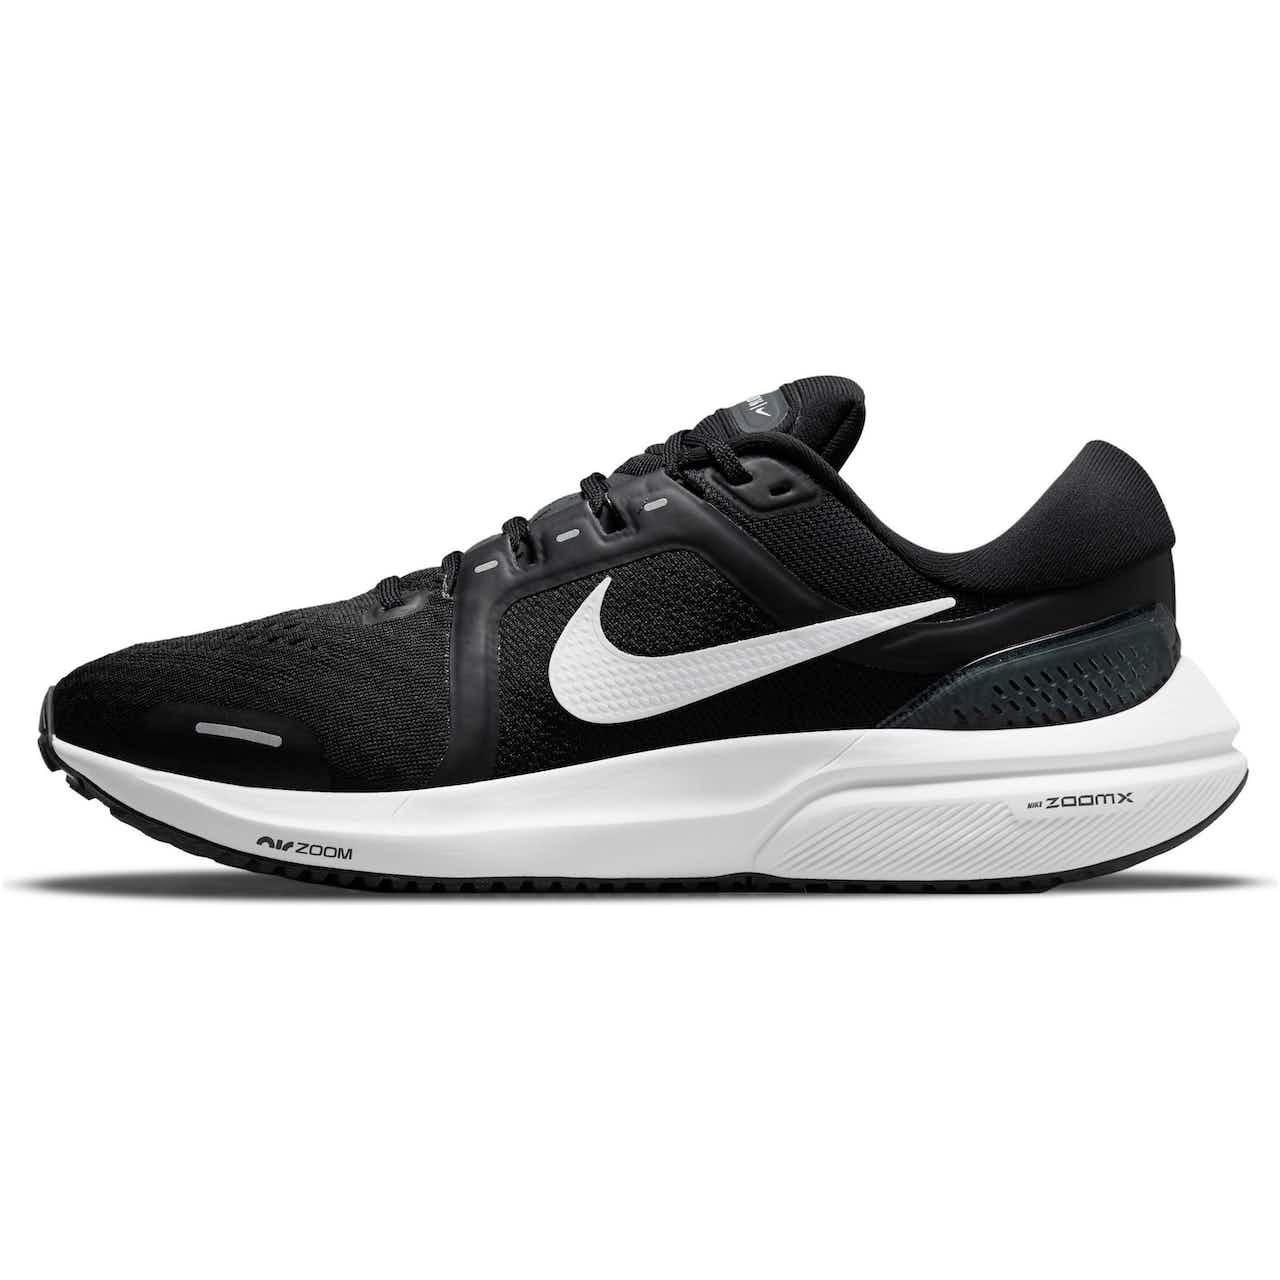 Nike AIR ZOOM VOMERO 16 Laufschuhe Herren